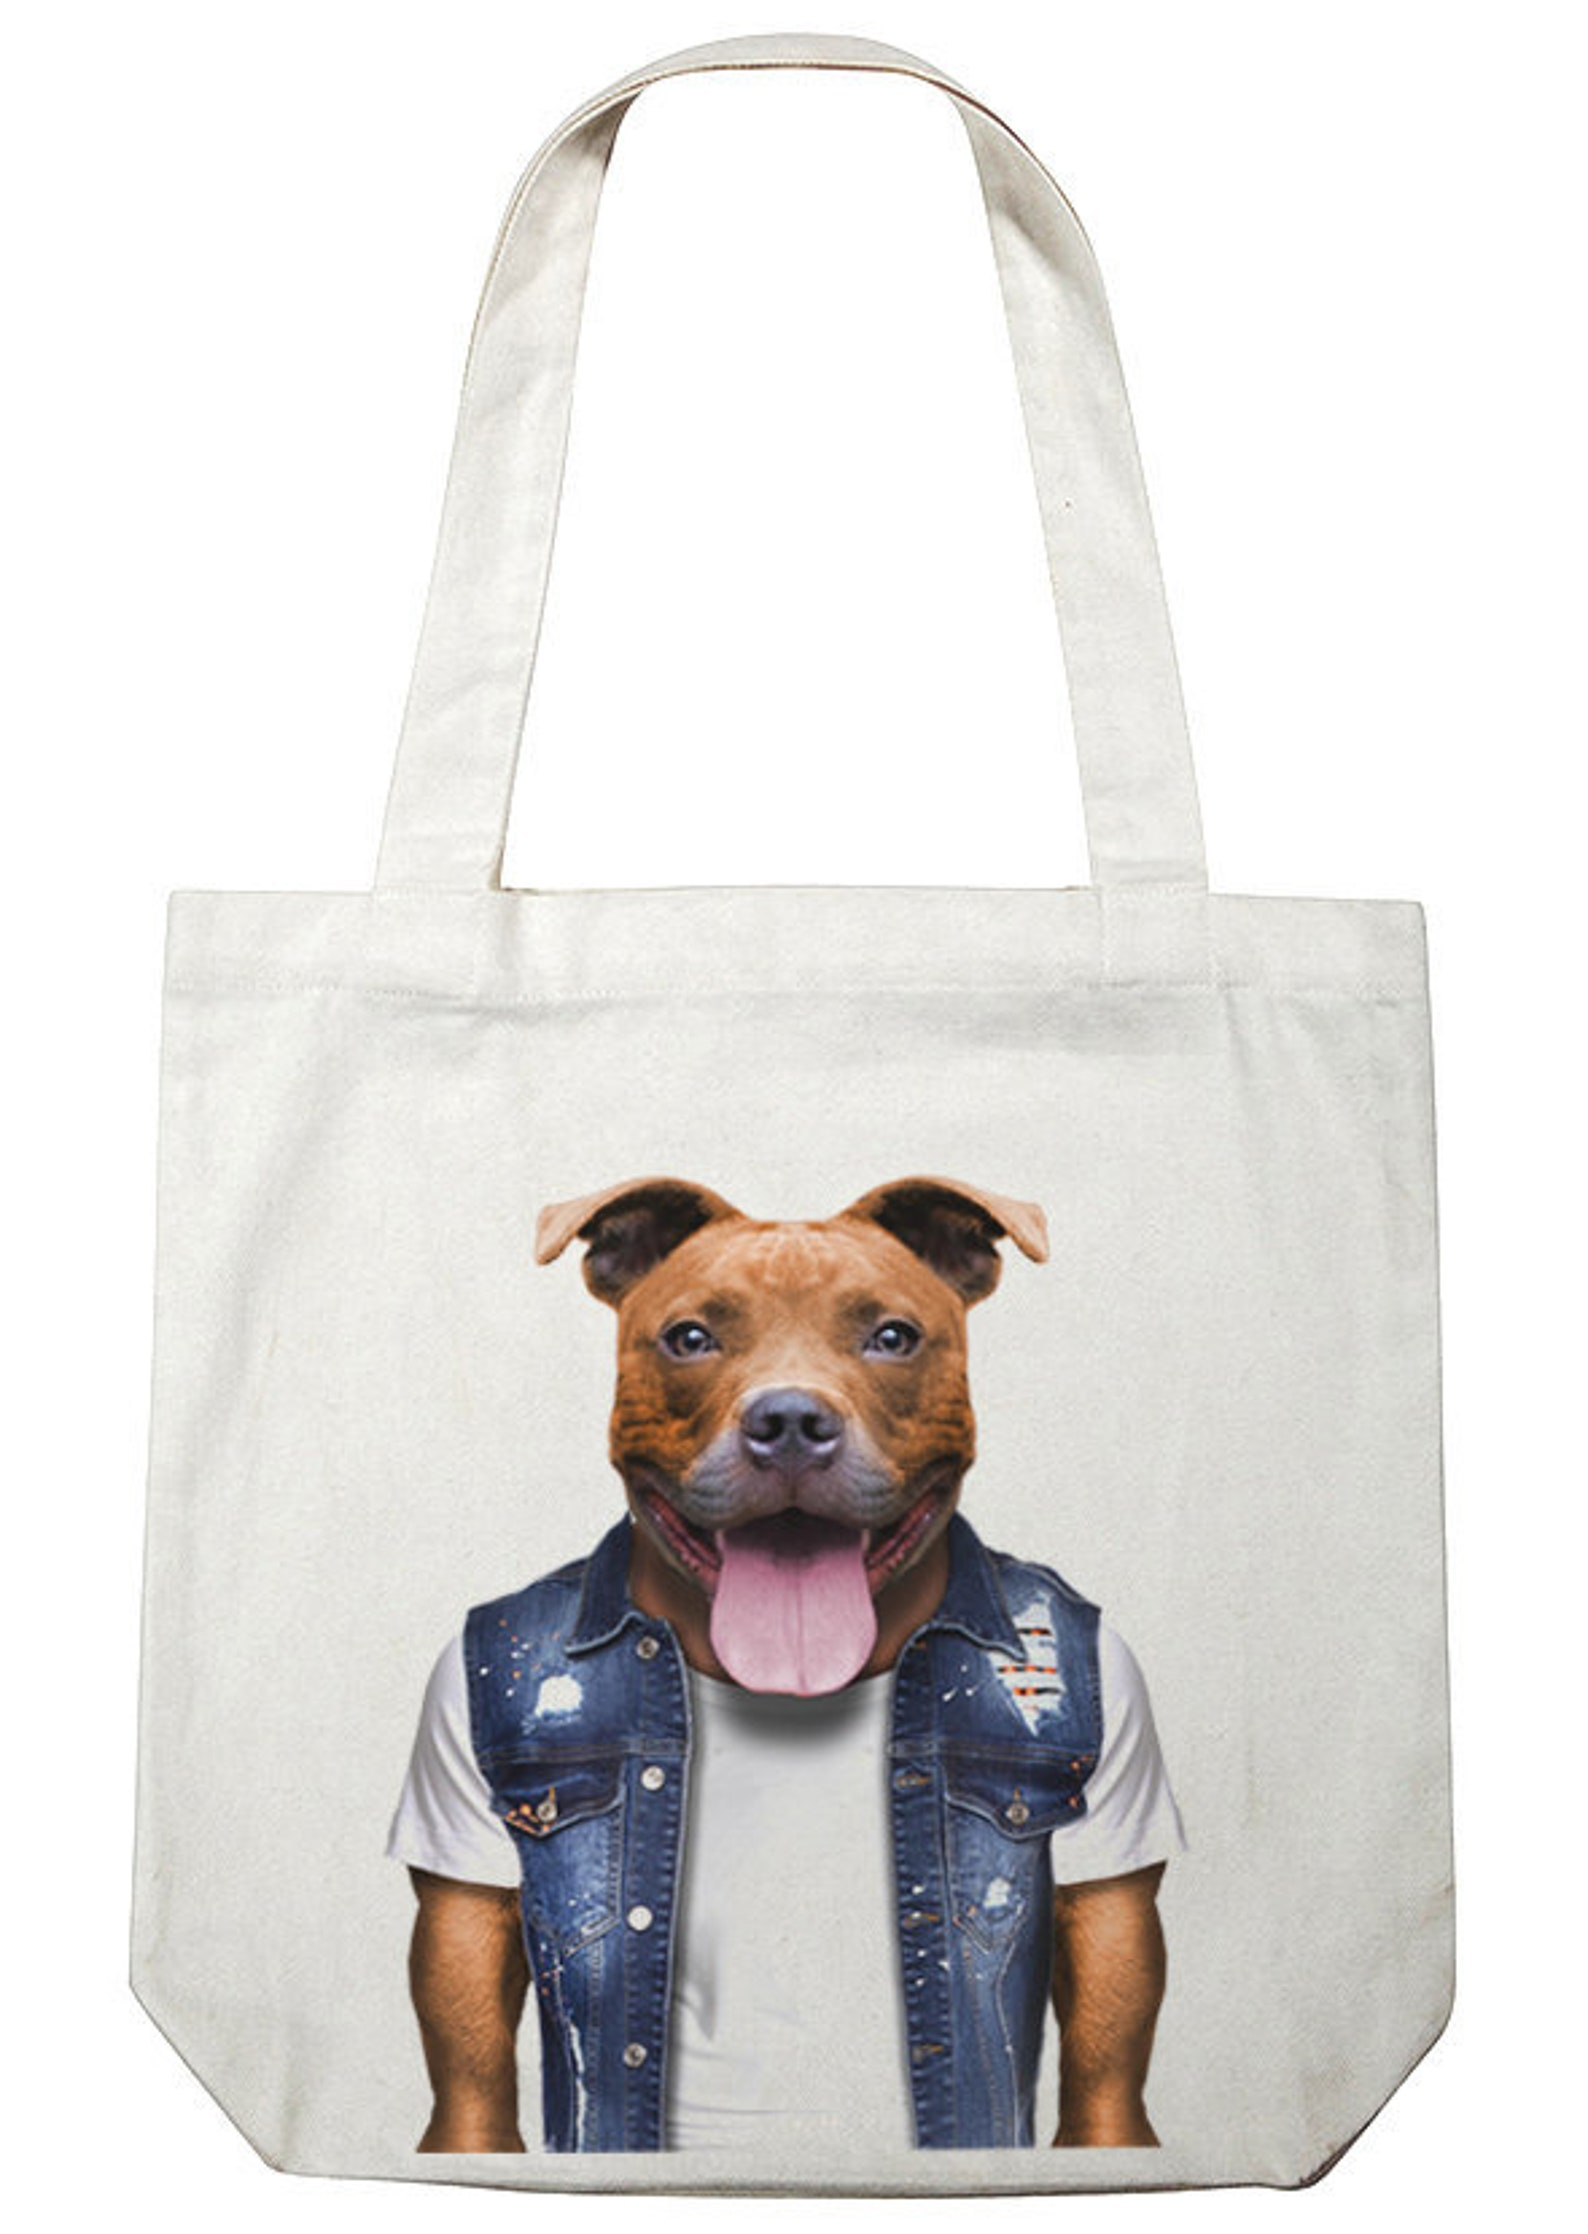 Staffy print tote bag